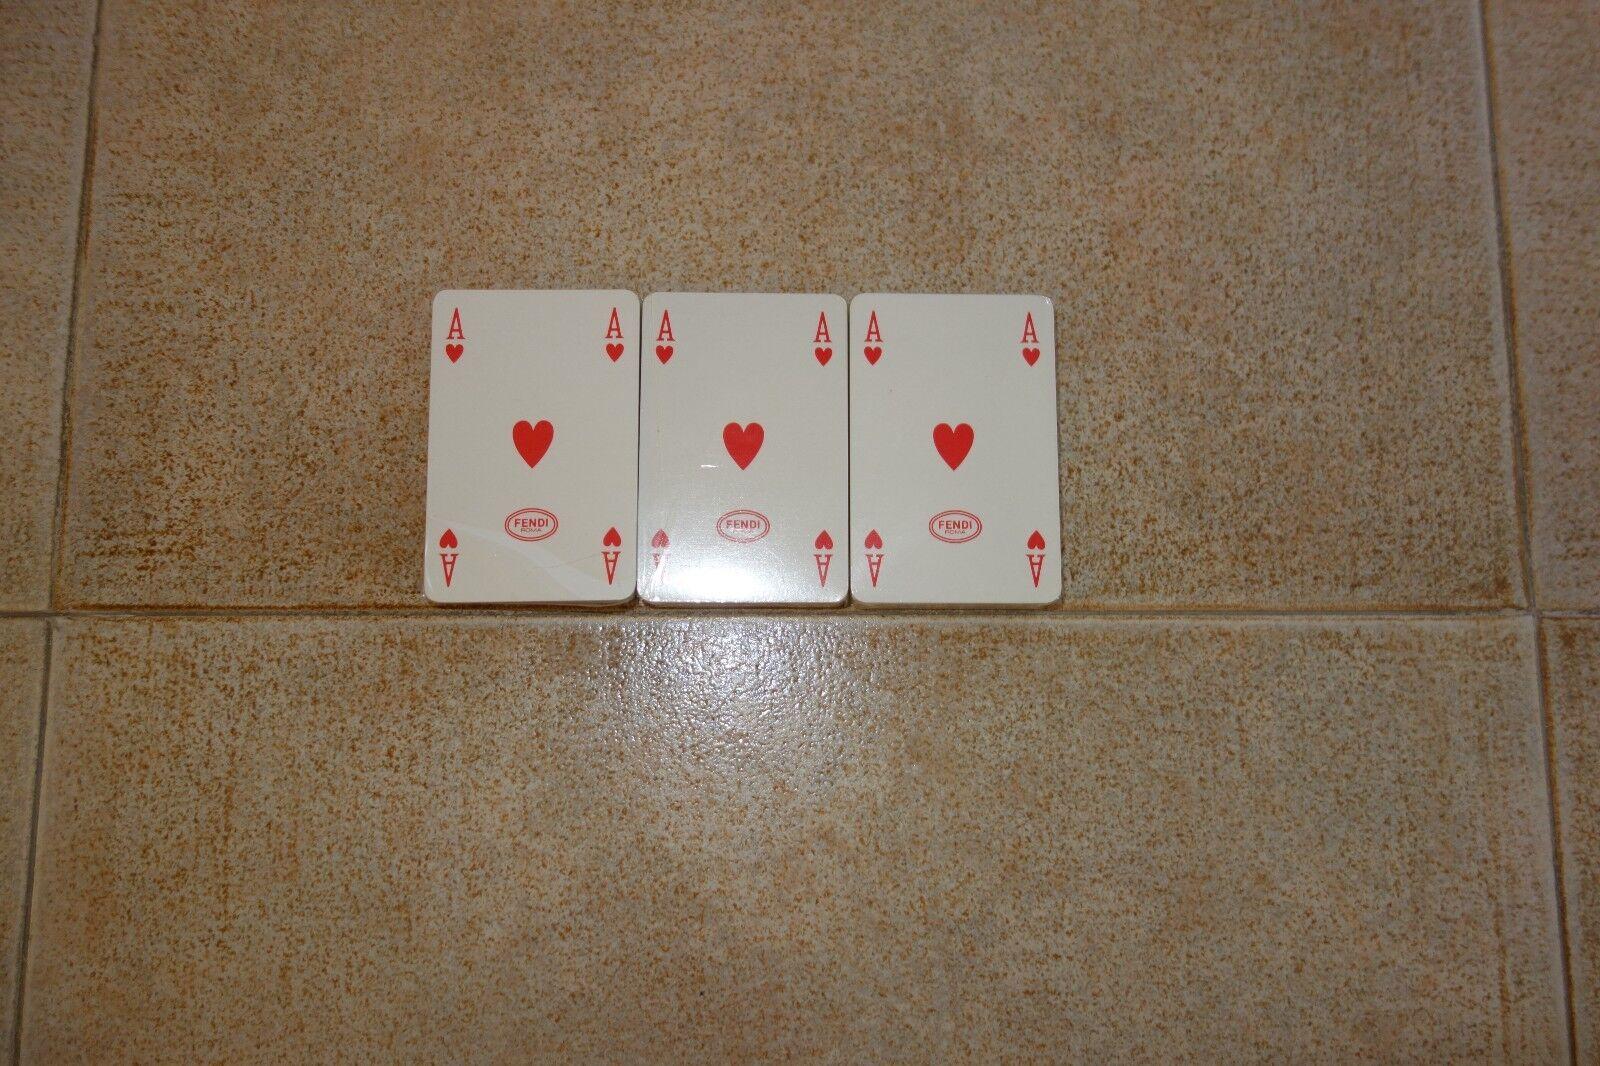 JUMBO PLAYING CARDS BIG GAMES XL NOT A4 EXTRA LARGE GIANT bridge poker Pontoon